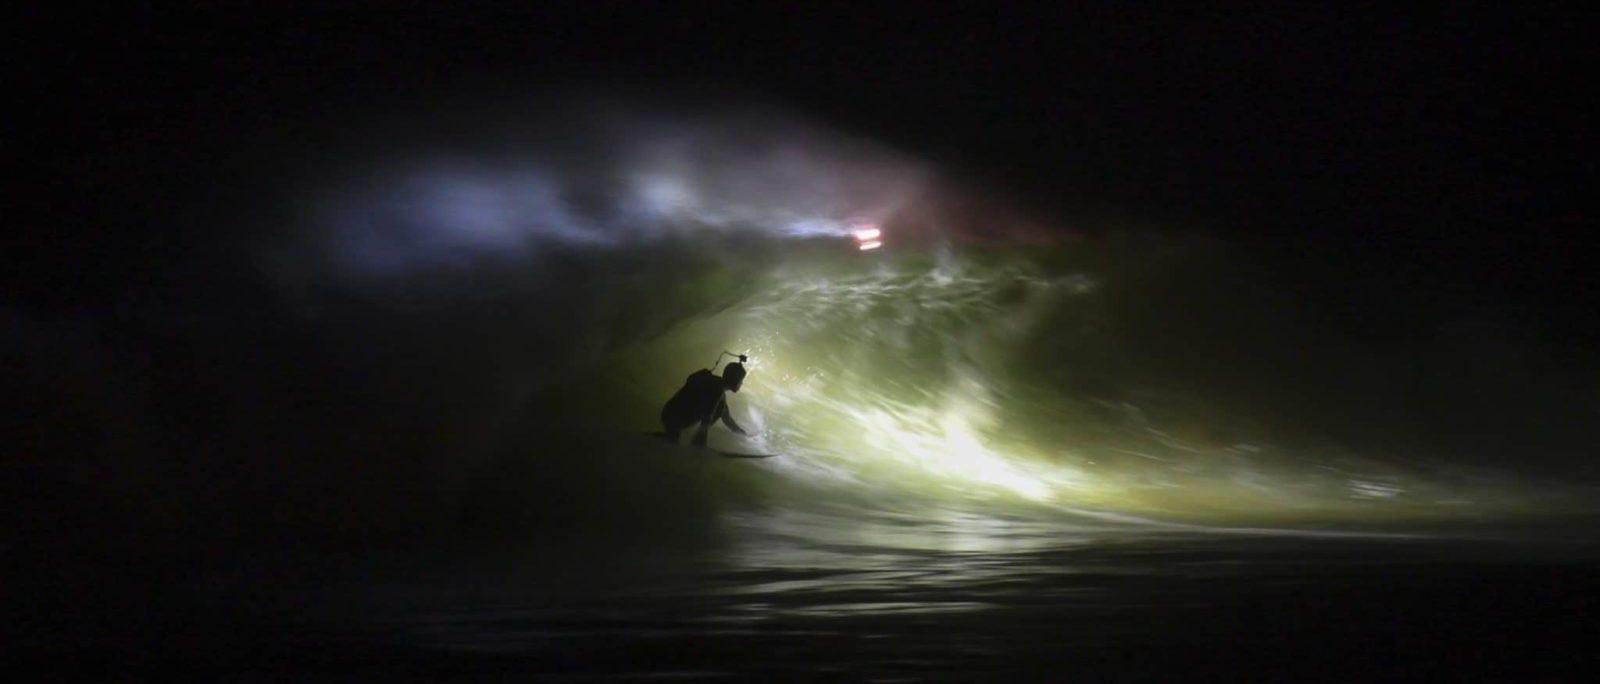 aurelien jacob tuberiding an solid wave at mundaka by night